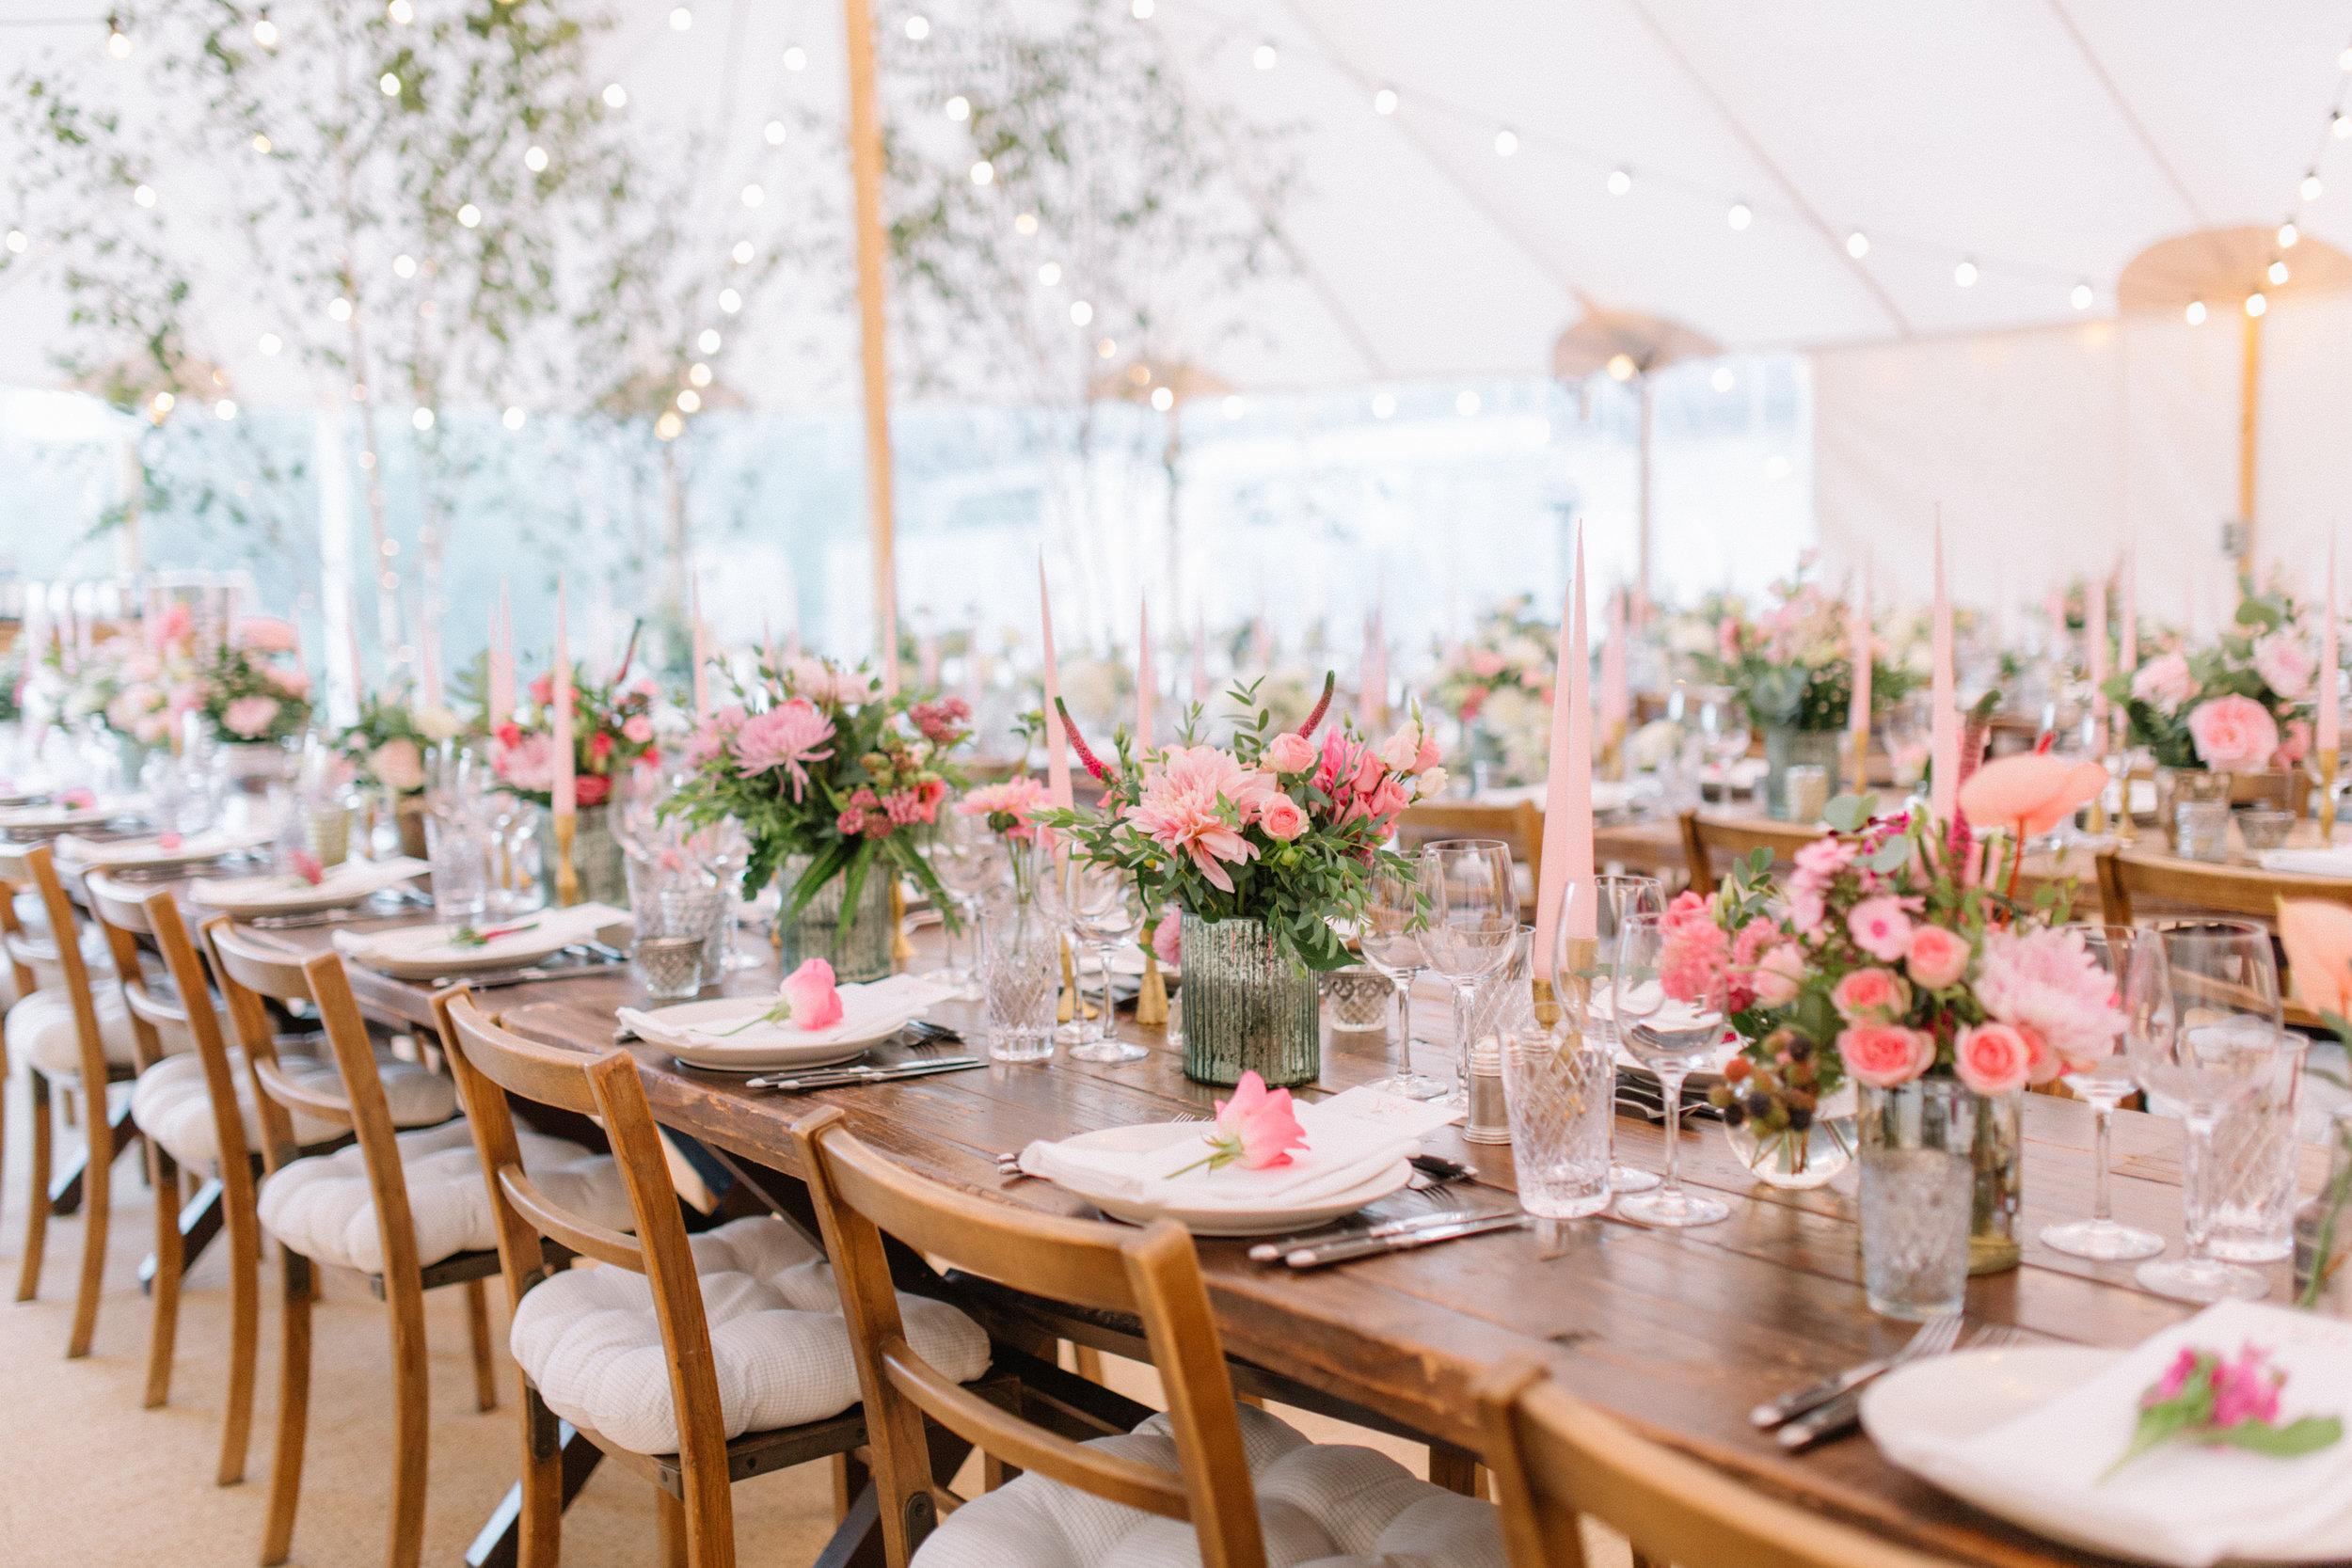 sofie & Mario - A country wedding at Soho Farmhouse